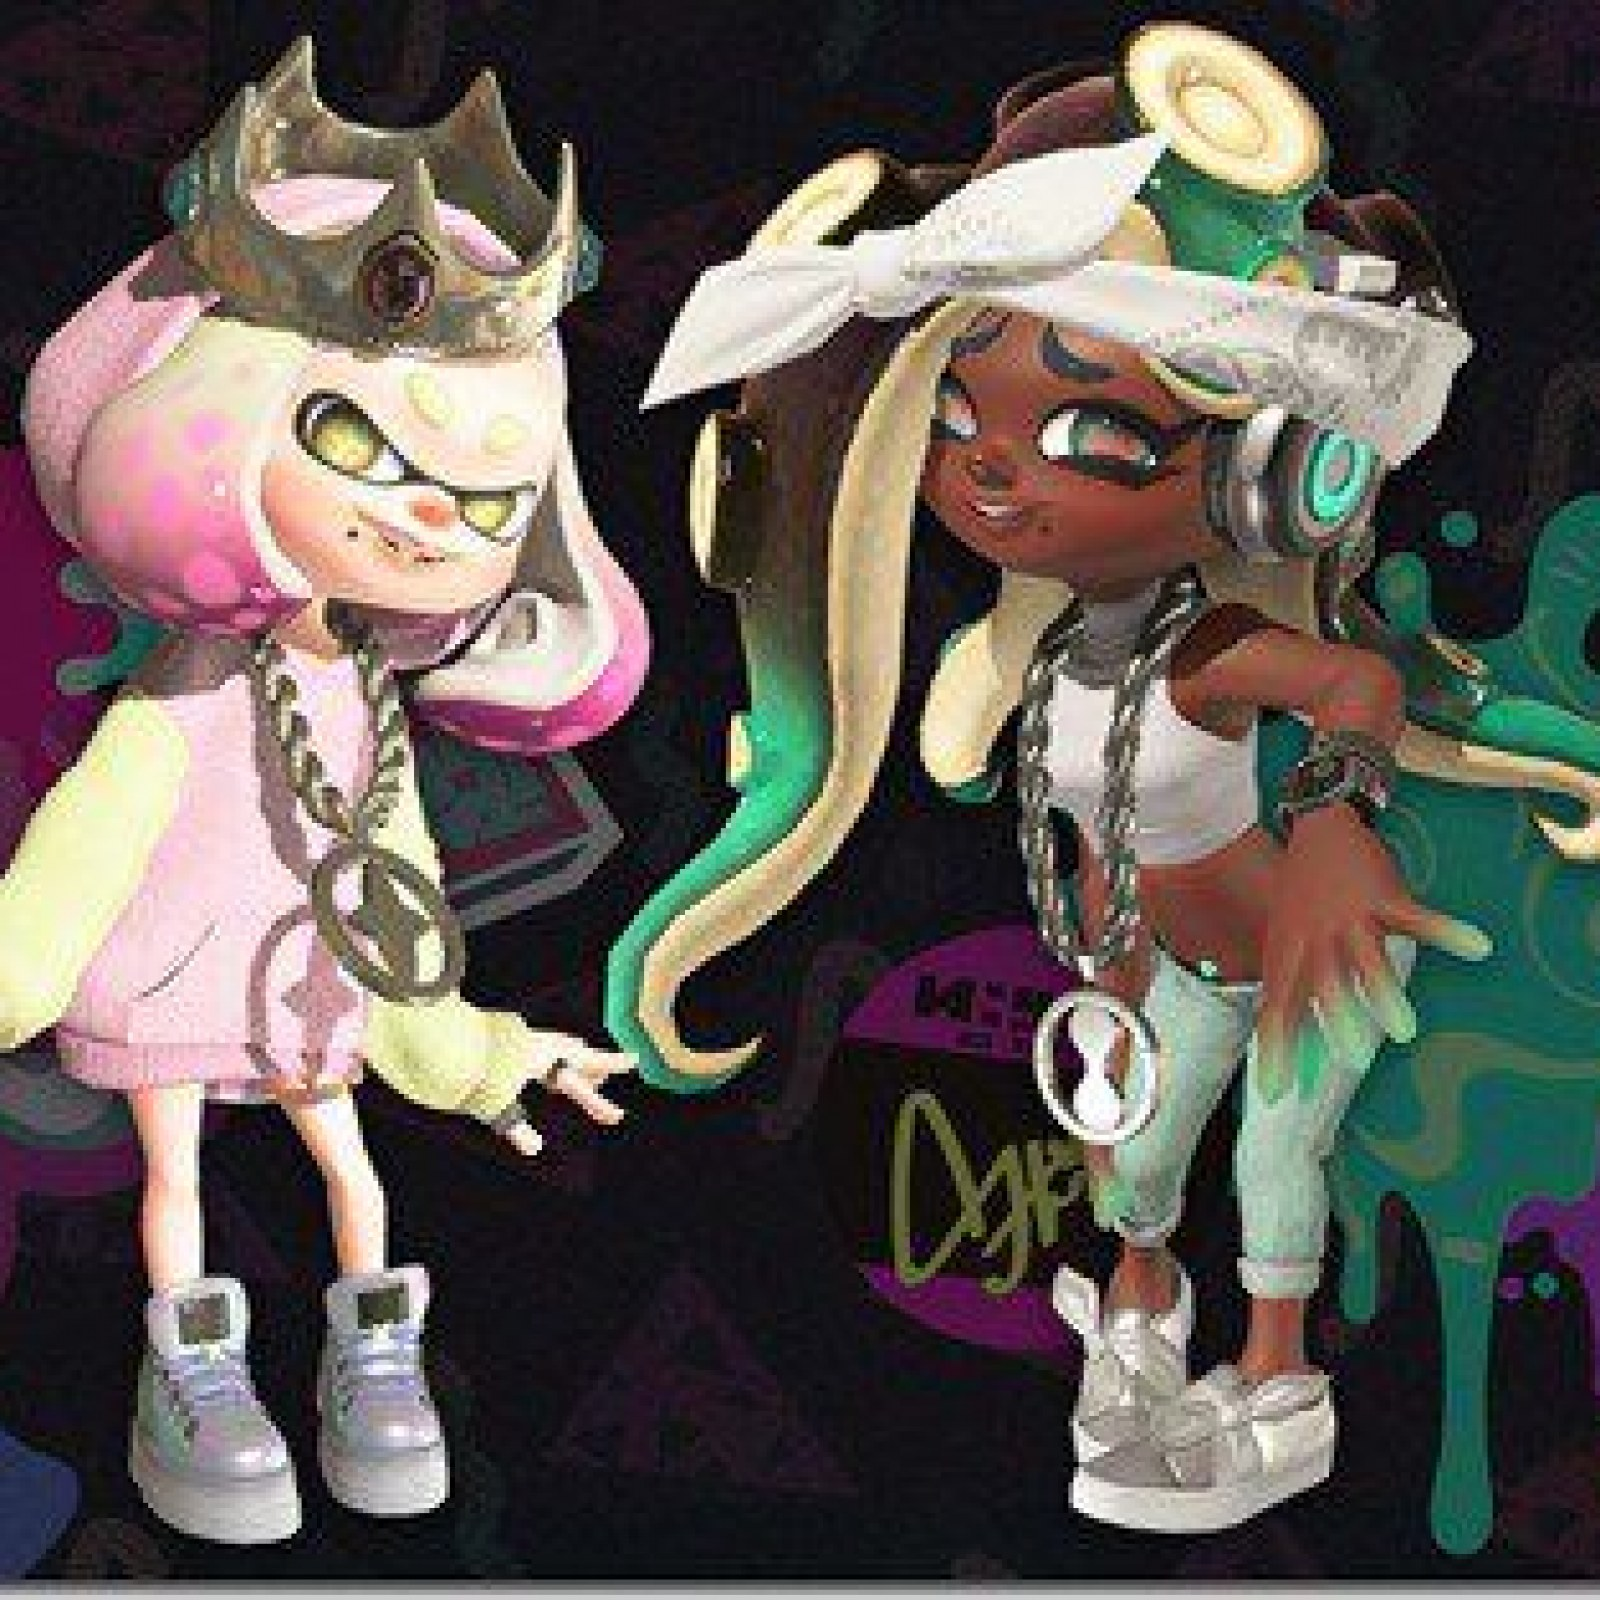 Splatoon 3 Trends After Missing Marina Sparks Talk Of Possible